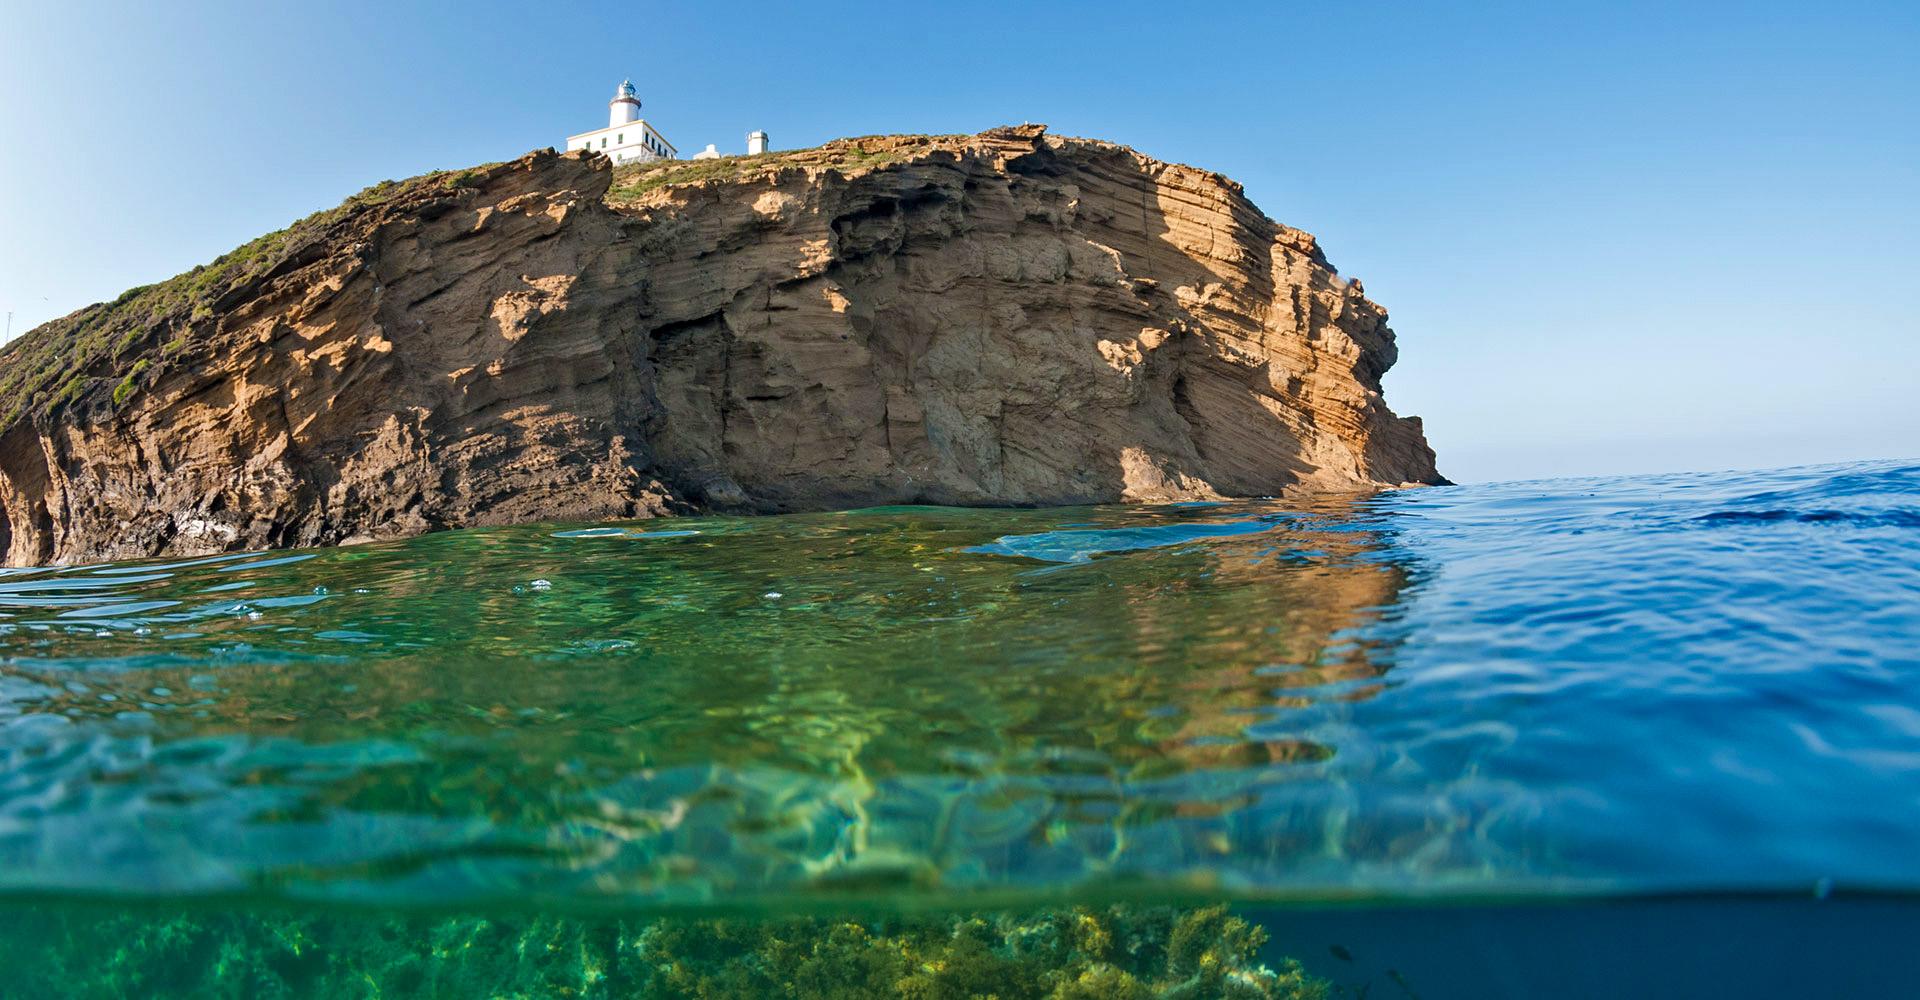 Turismo Alcossebre. Parque Natural de las Islas Columbretes